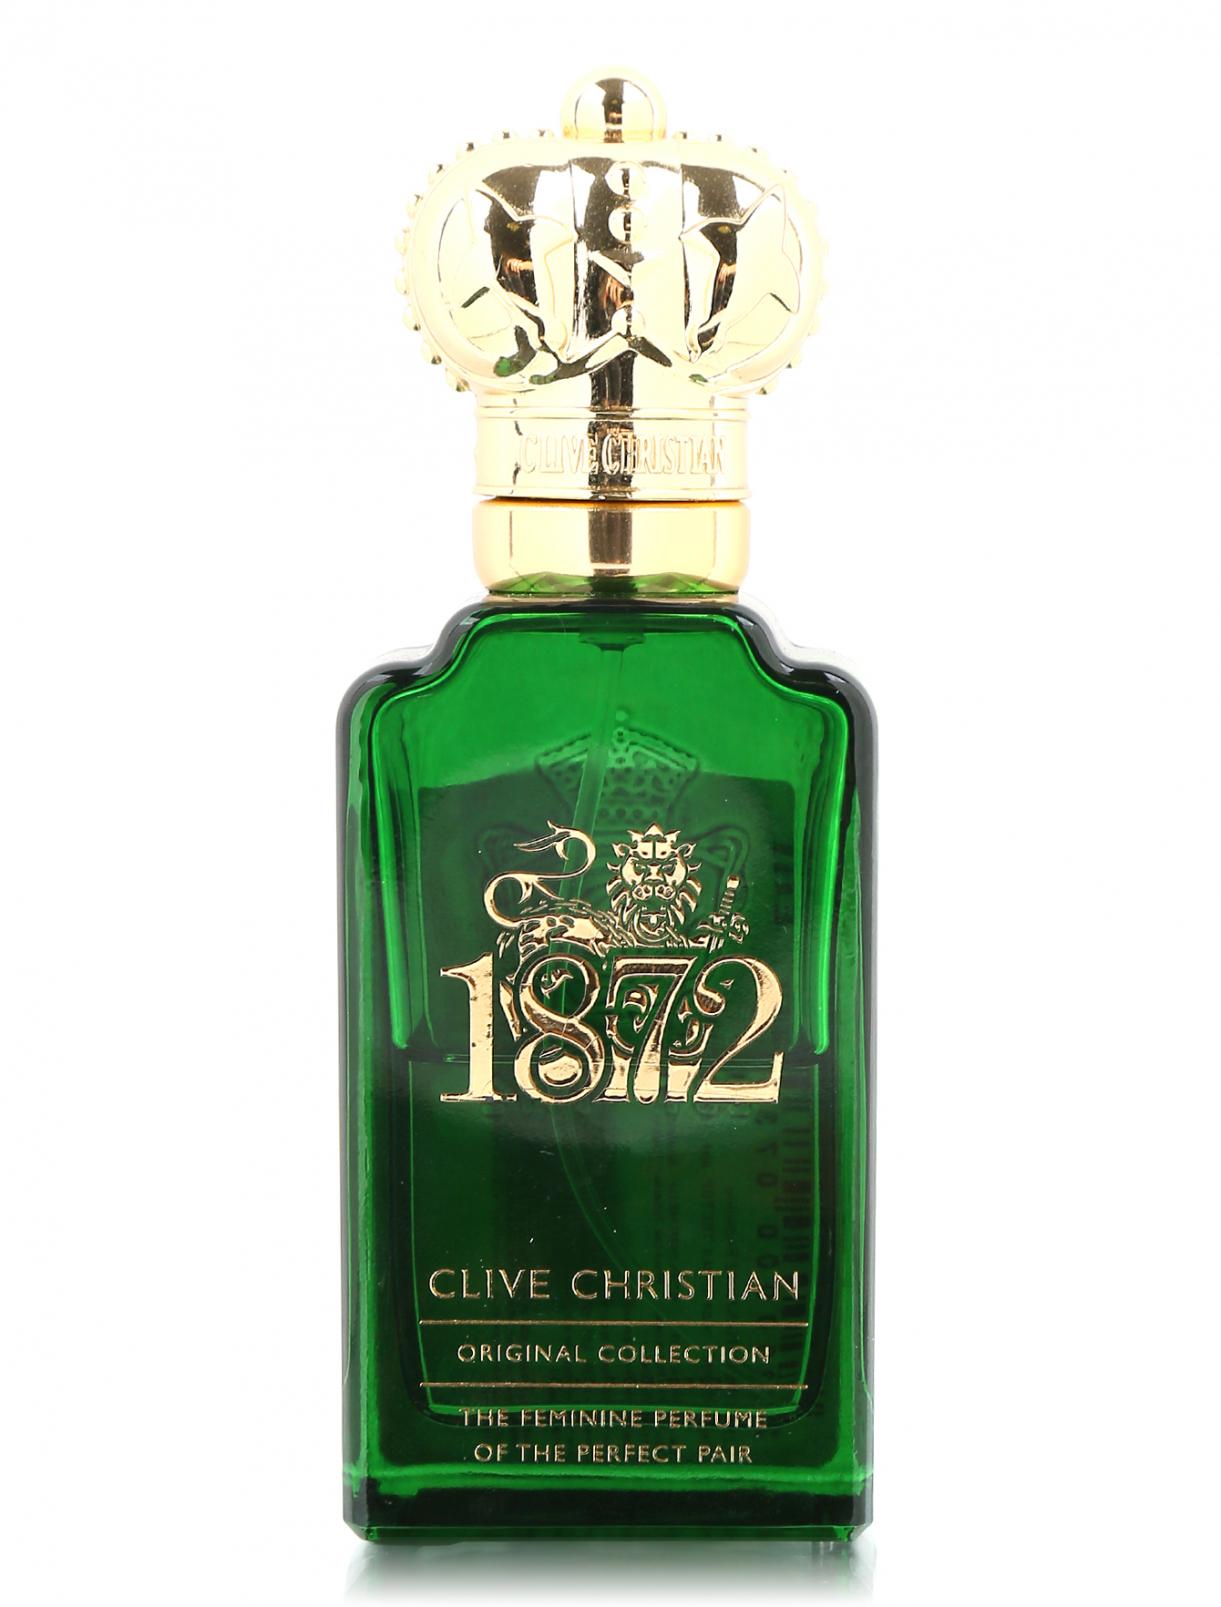 Парфюмерная вода 100 мл 1872 Clive Christian  –  Общий вид